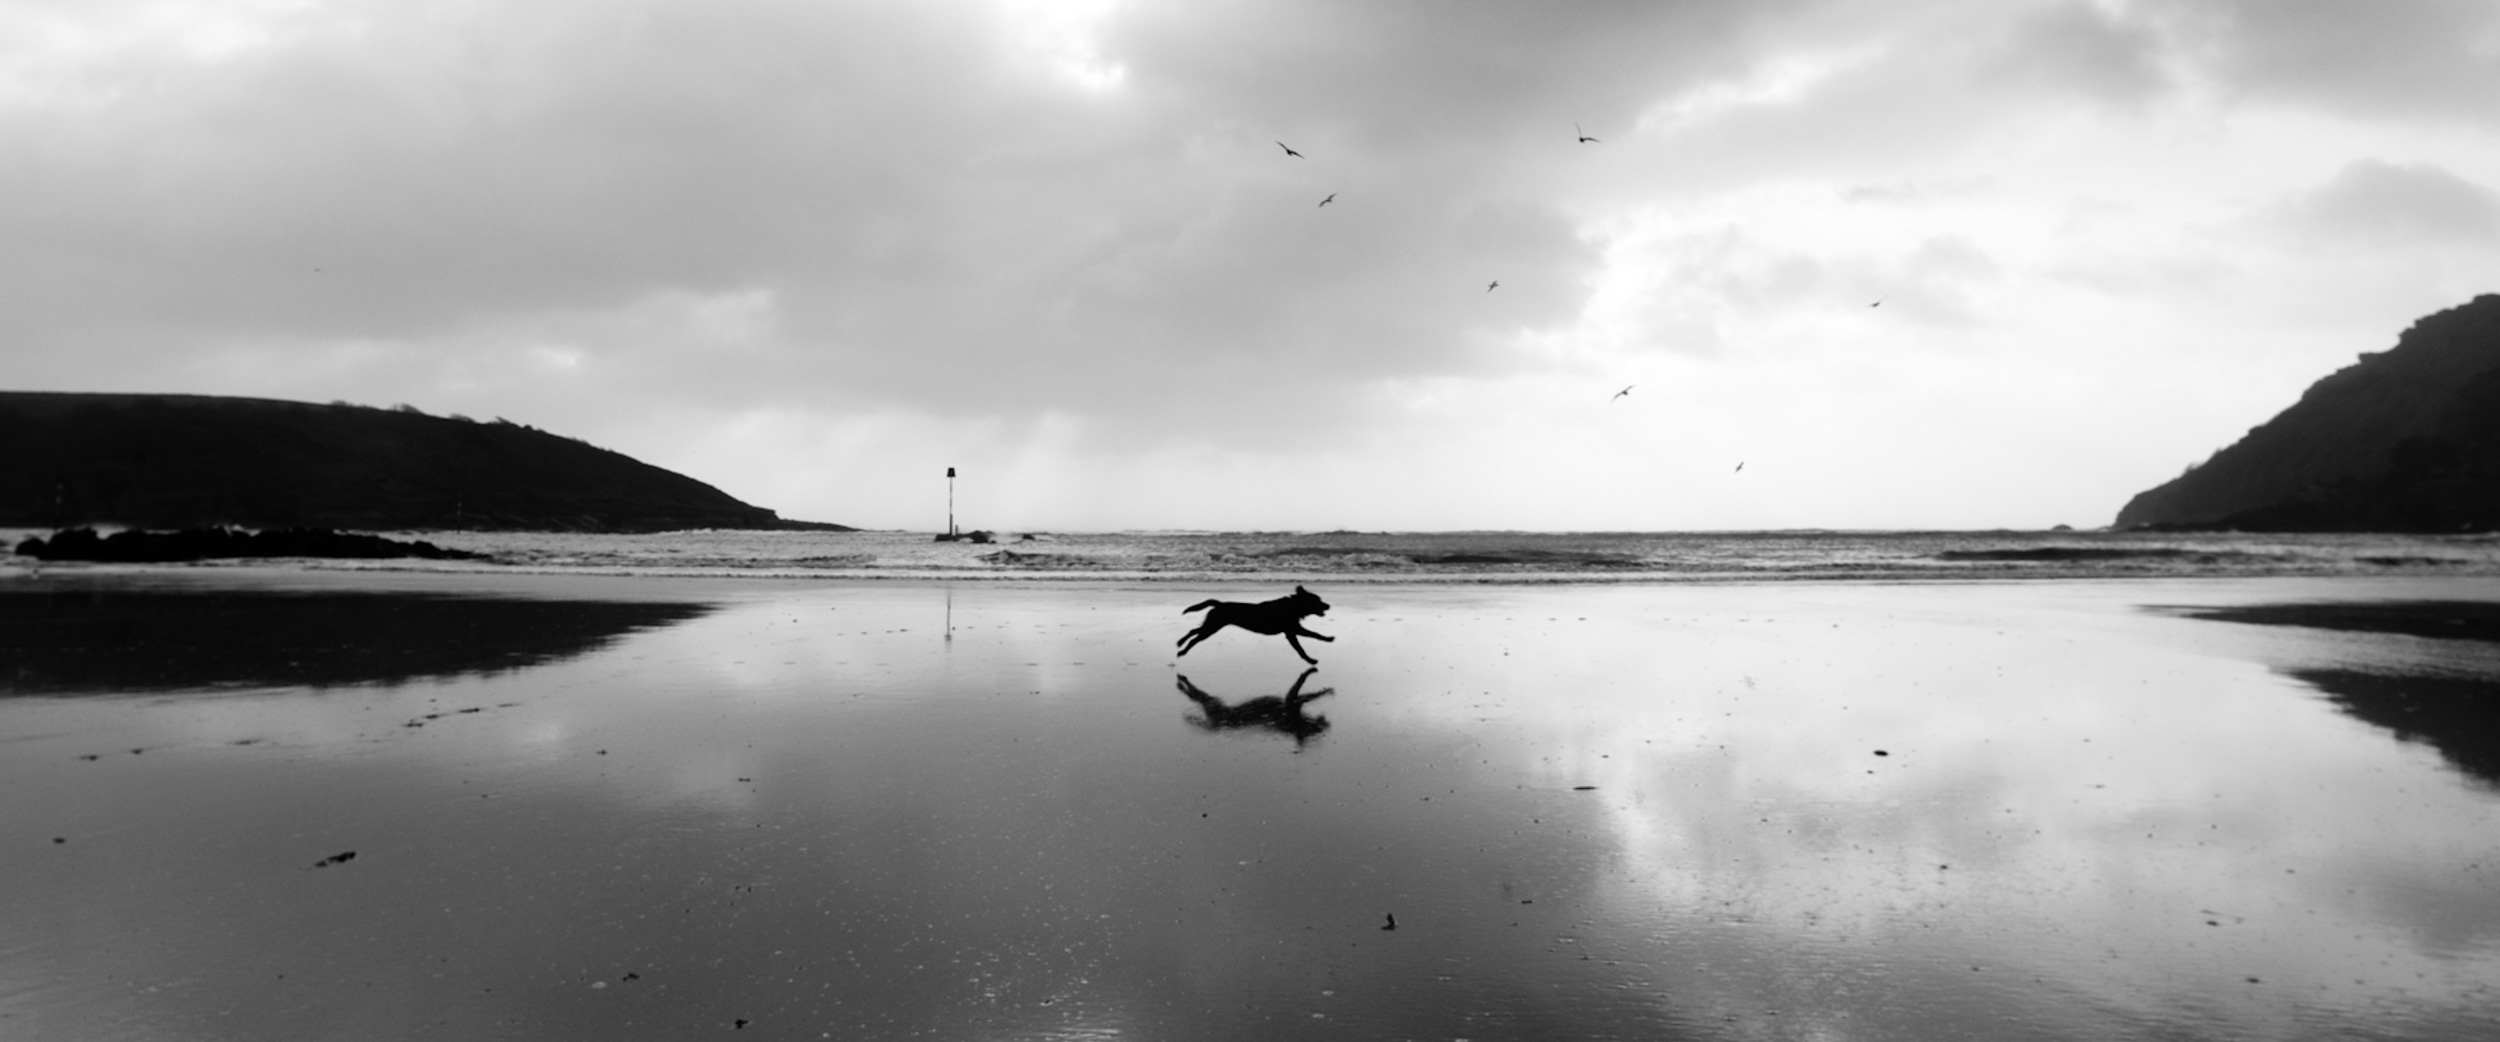 dog north sands 6x4.jpg